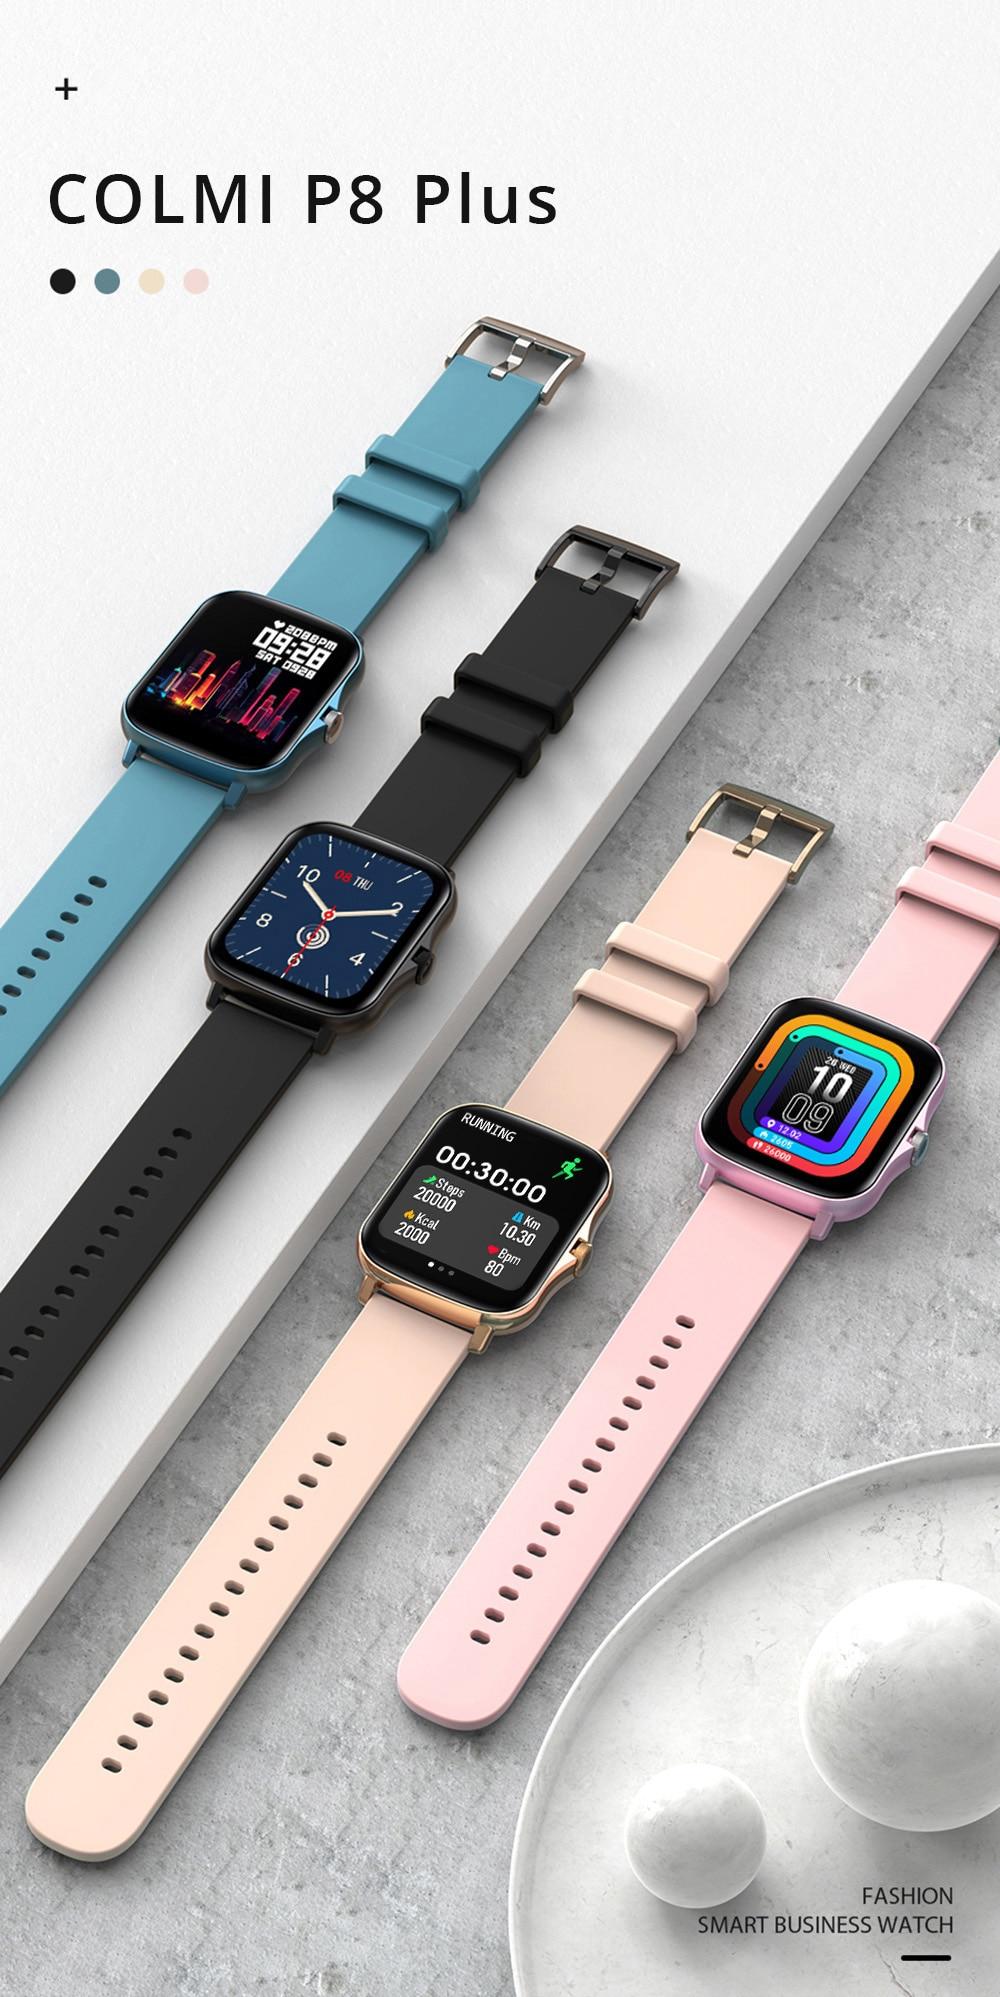 H3f95356212bd4db7aef8b9e21050e712c COLMI P8 Plus 1.69 inch 2021 Smart Watch Men Full Touch Fitness Tracker IP67 waterproof Women GTS 2 Smartwatch for Xiaomi phone